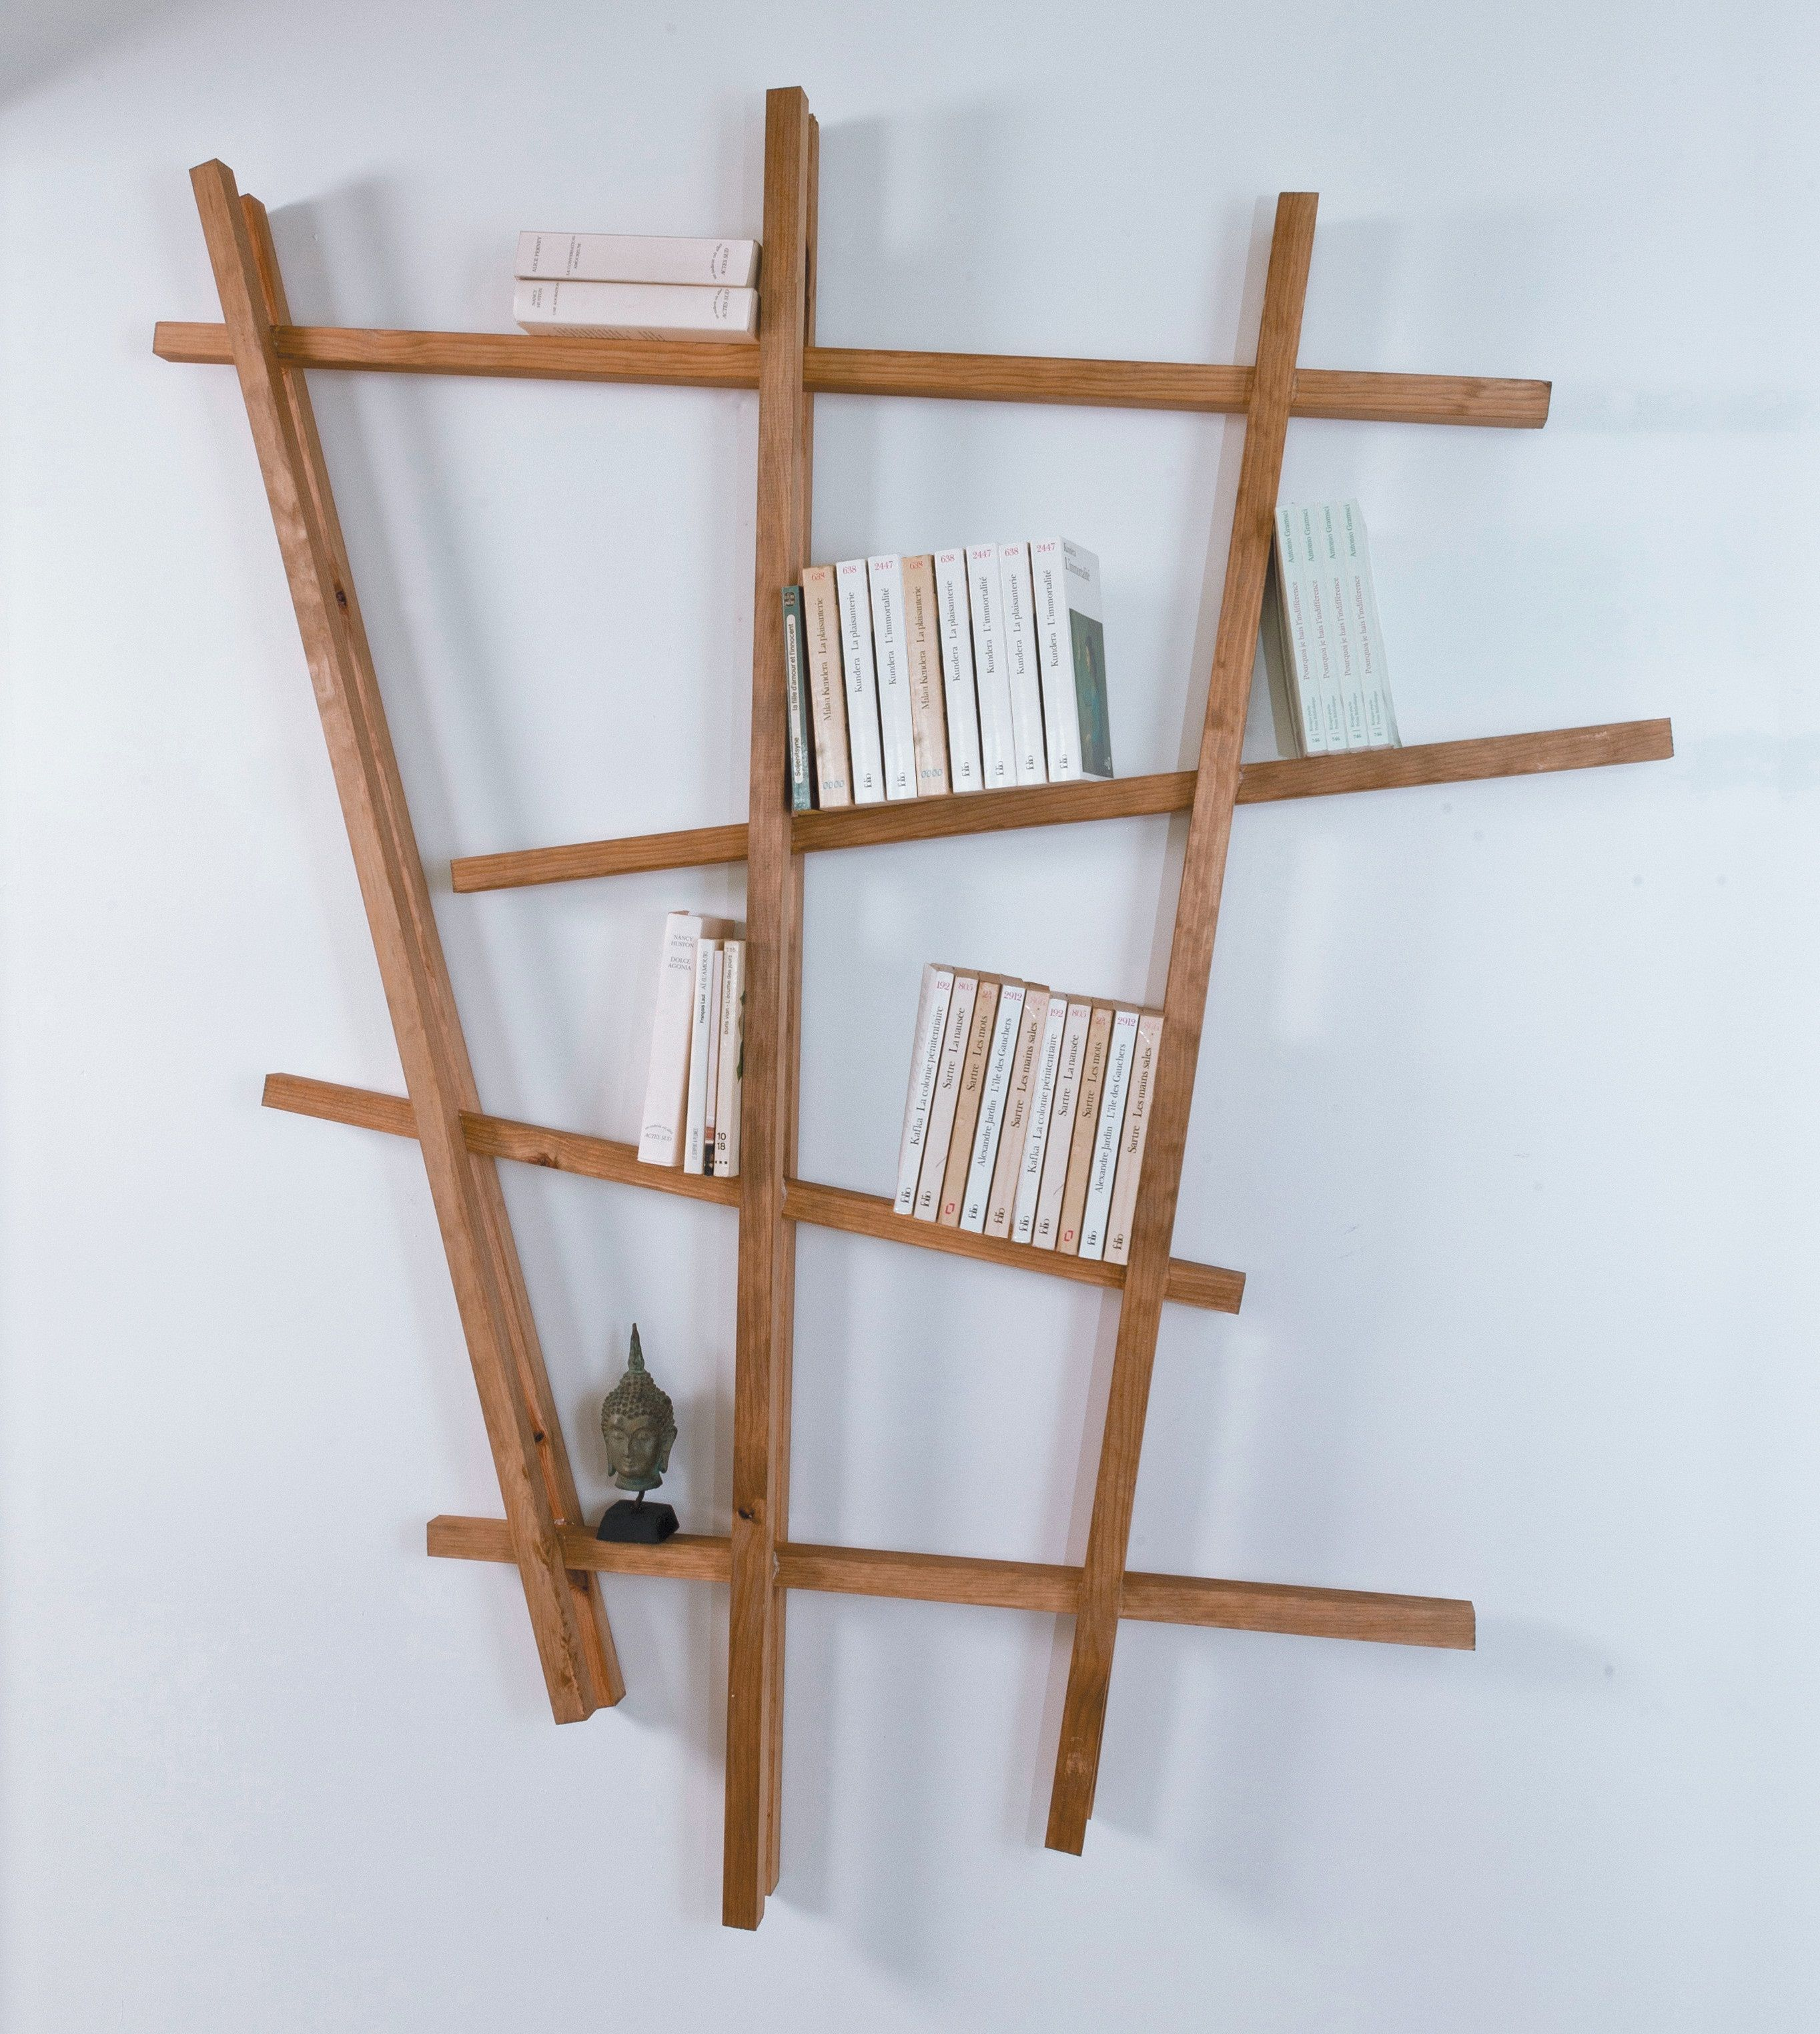 Pin De Aimal Uthmankhel En Wow Tasseau Bricolage Deco Y Etagere